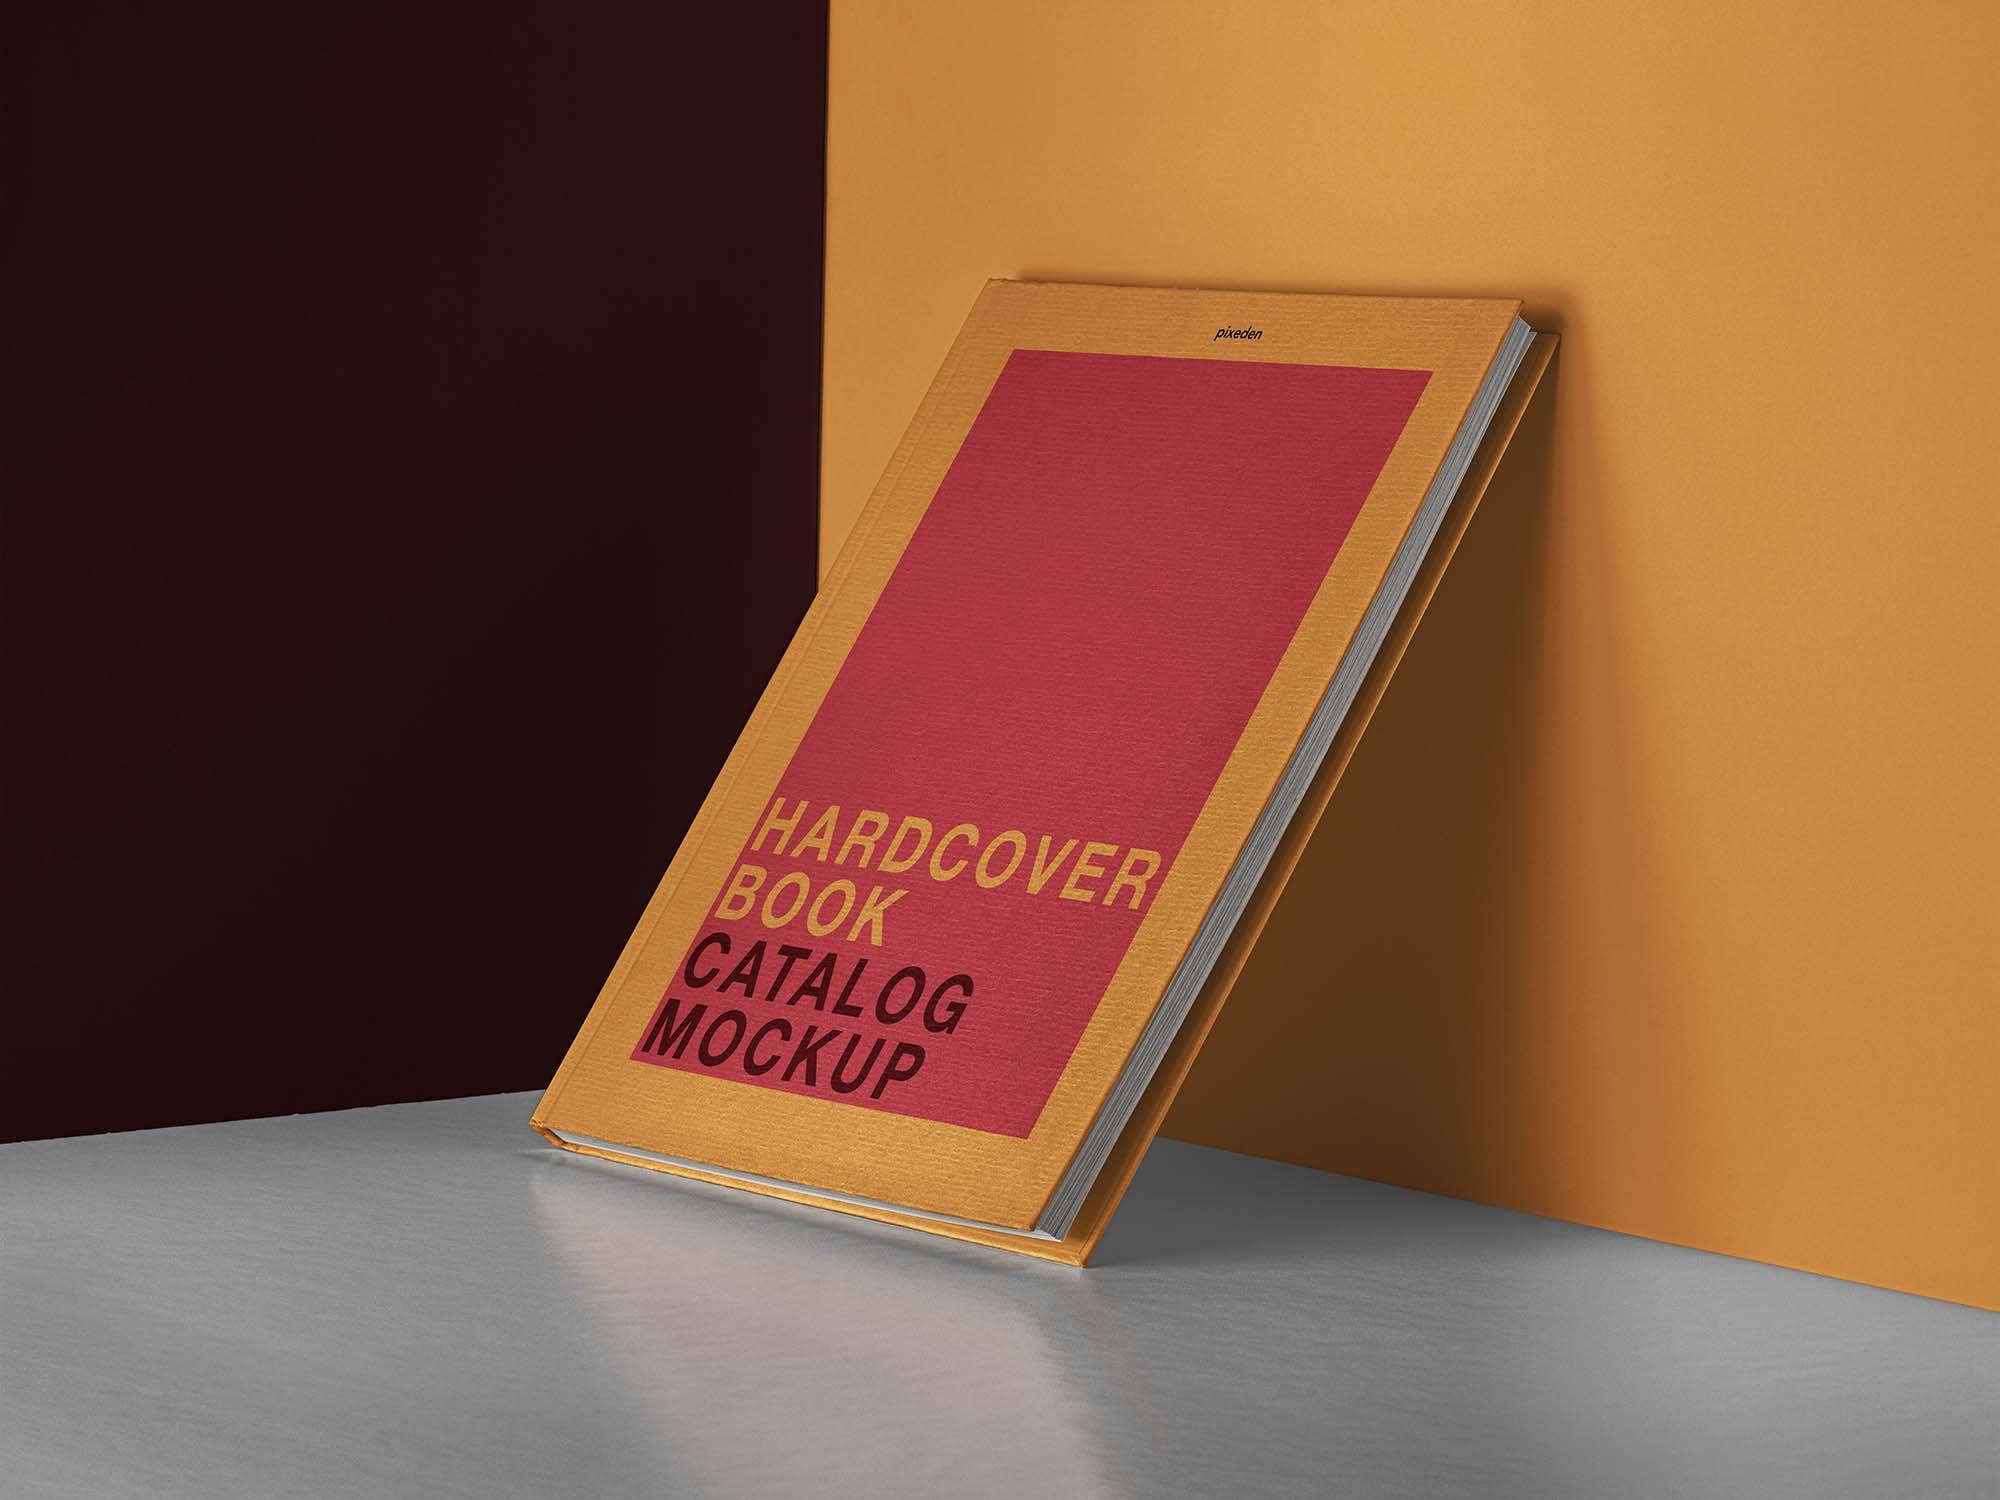 Hardcover Catalog Book Mockup